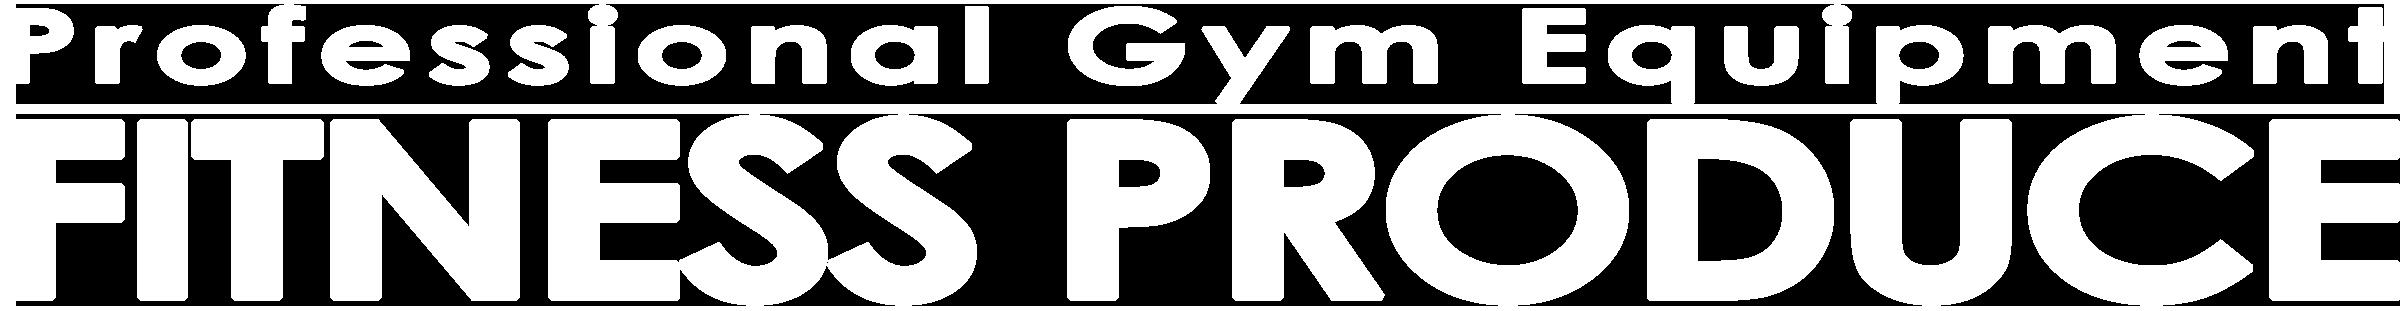 FITNESS PRODUCE - Professionele Fitnessapparatuur | Plate Loaded | Fitness Stations | Racks | Halterbanks | Halters | Fitness accessoires